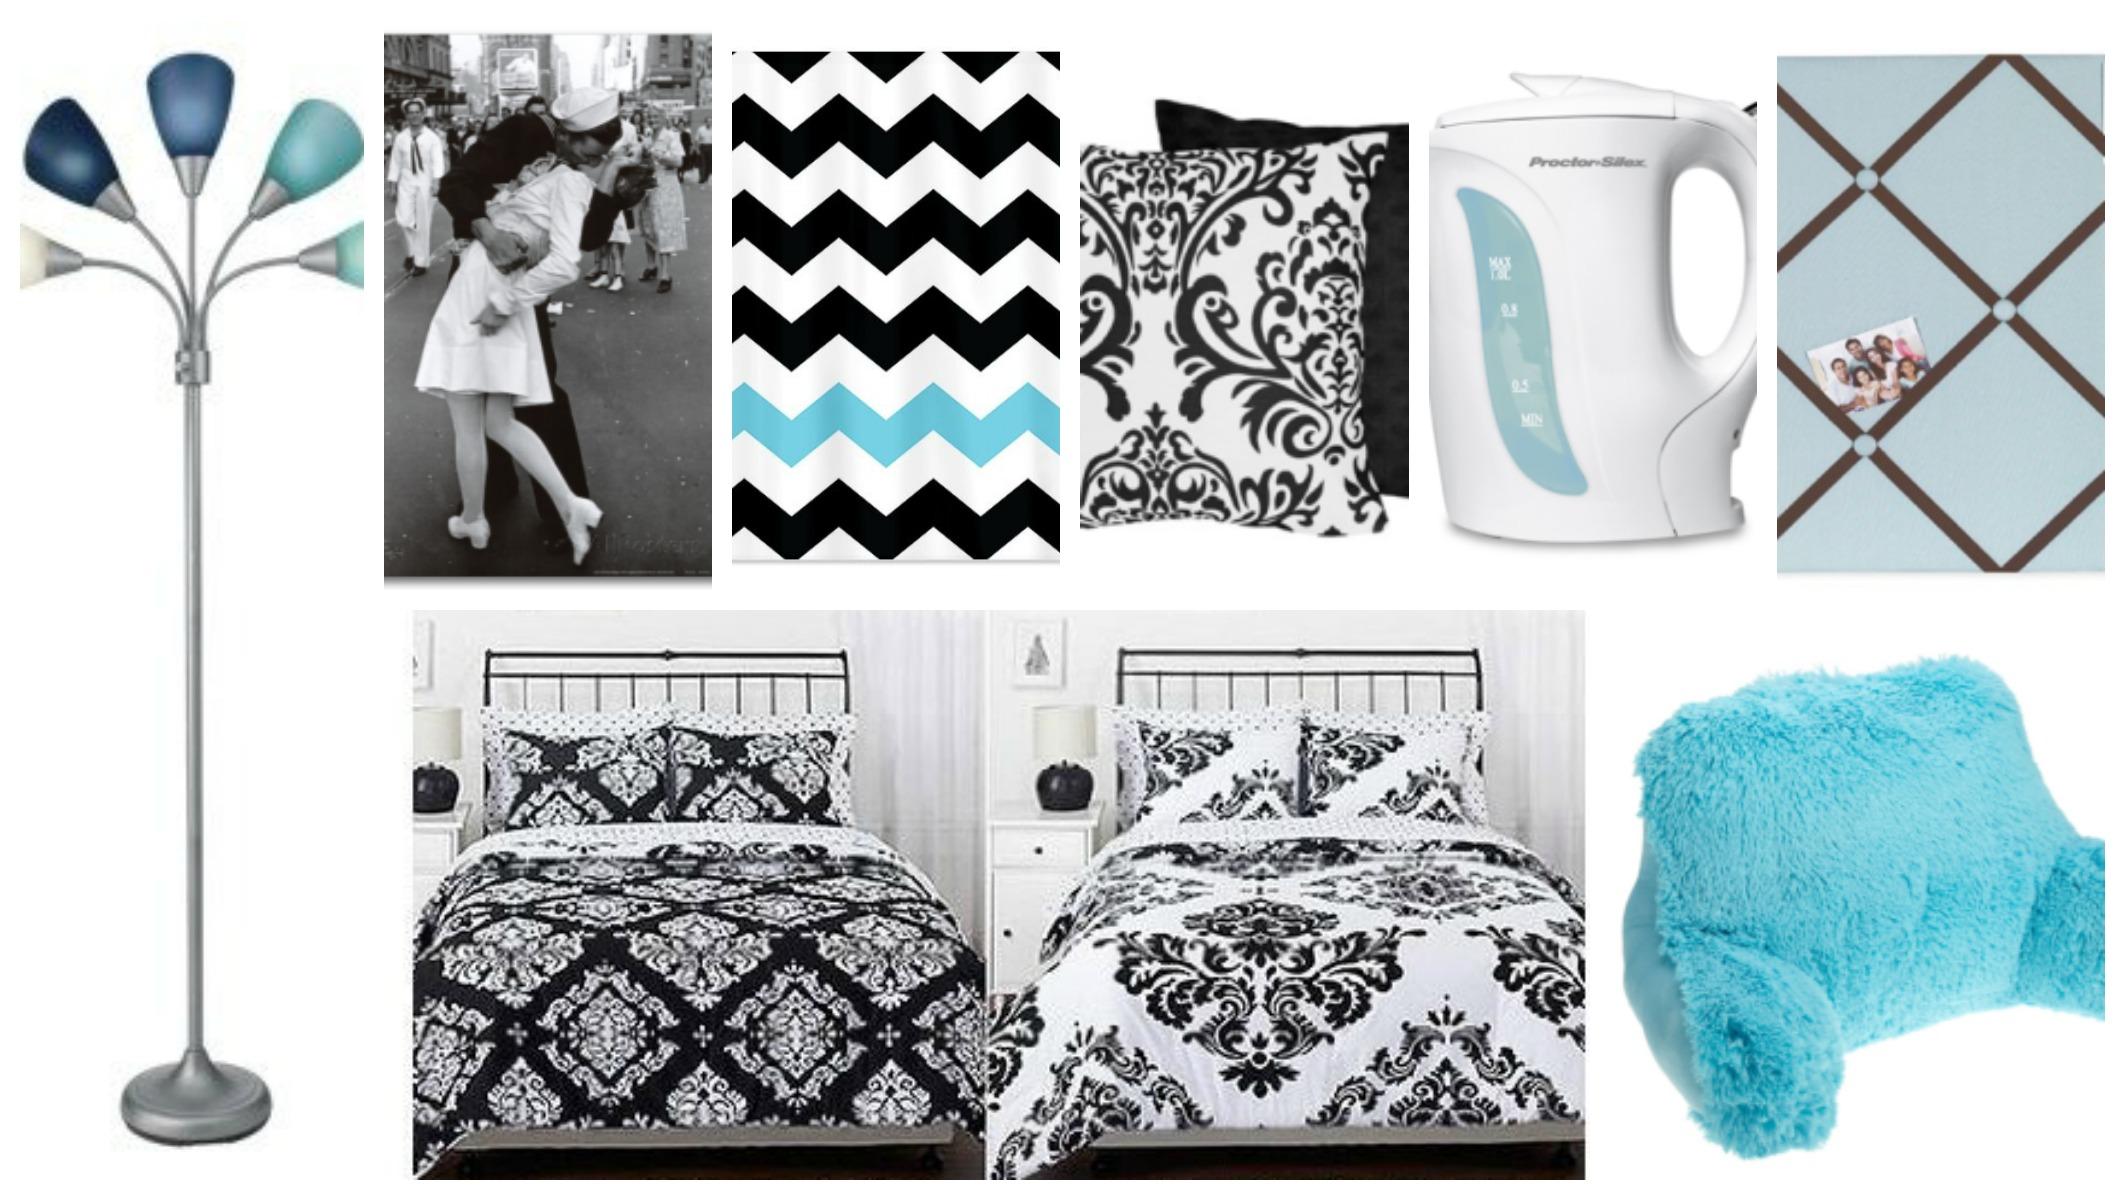 Dorm Room Decor and Essentials